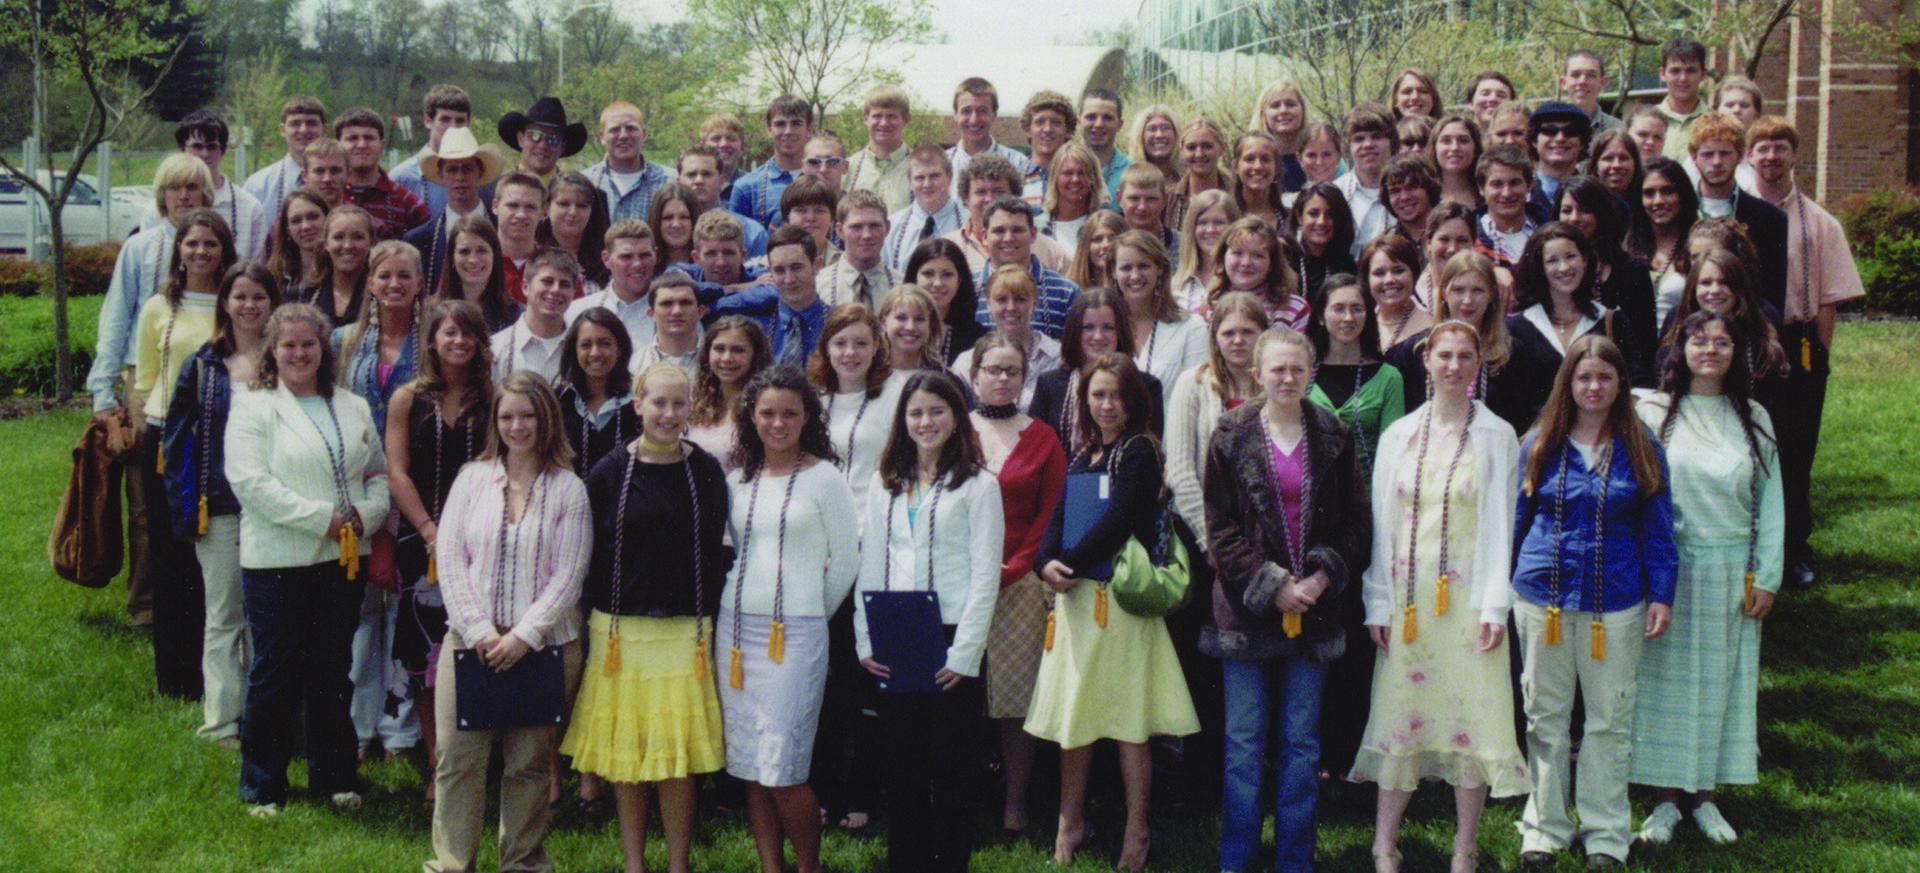 2005 Community Scholars